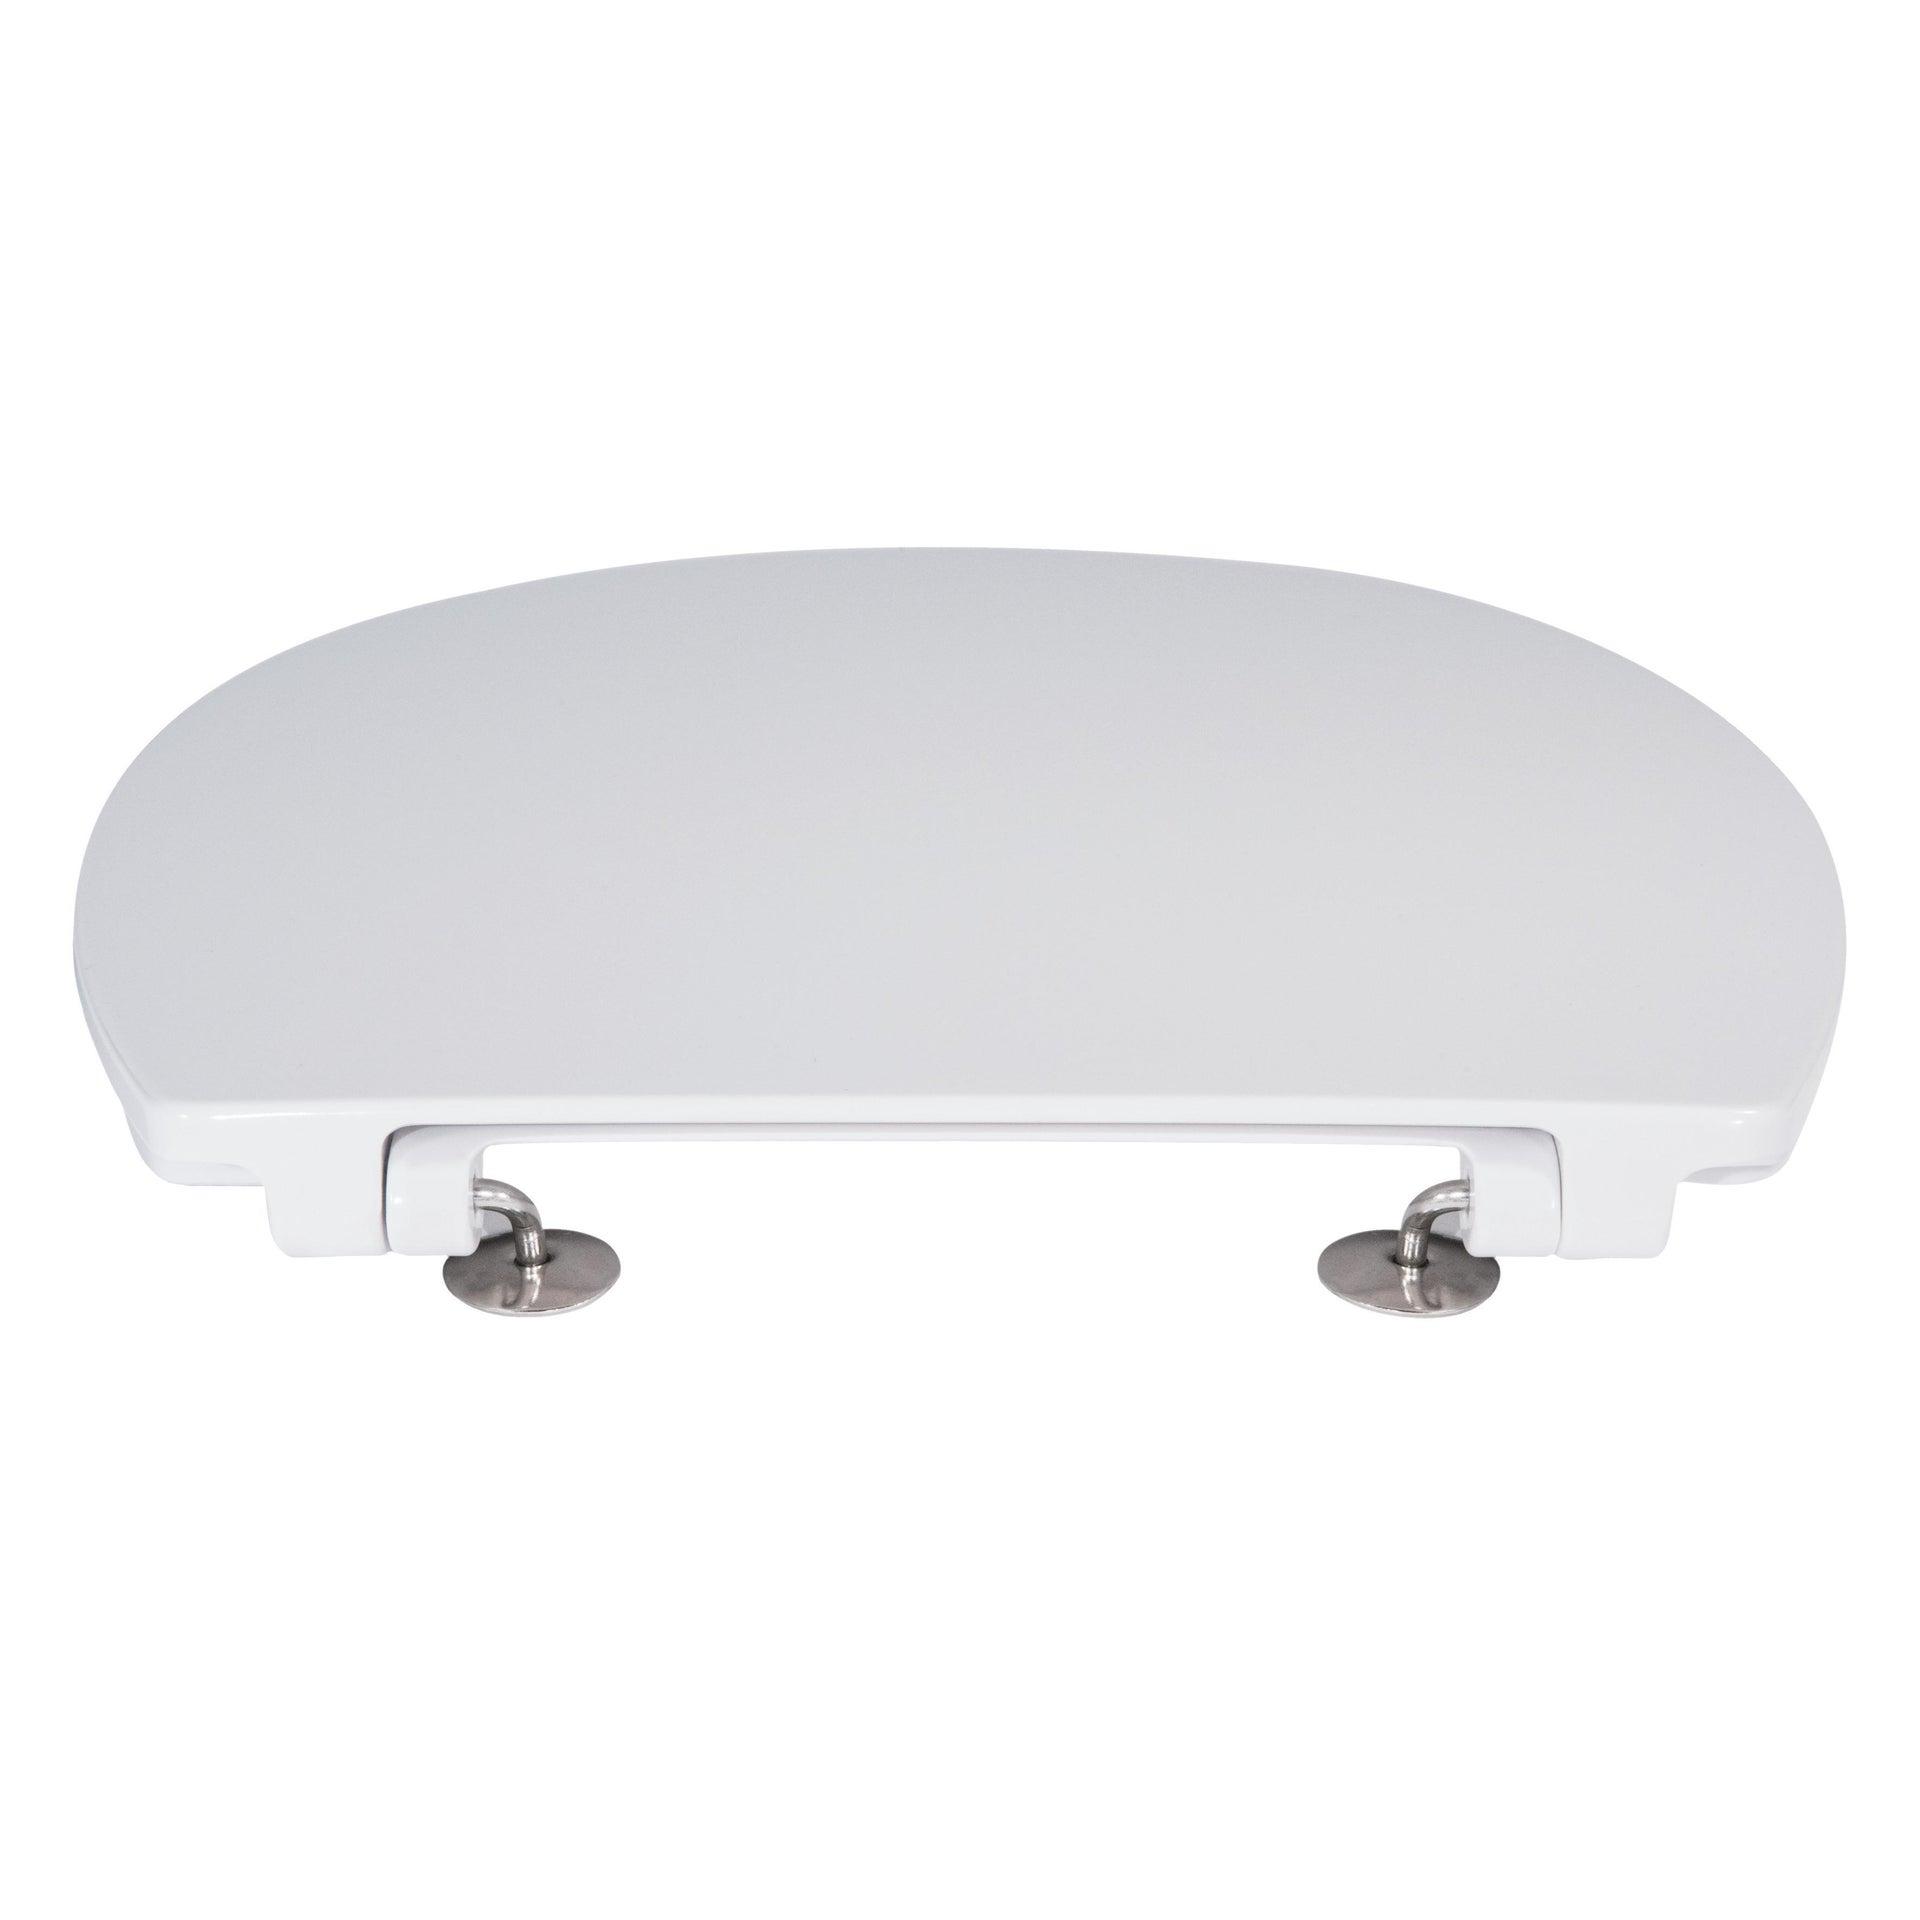 Copriwater ovale Originale per serie sanitari Miky New IDEAL STANDARD termoindurente bianco - 3